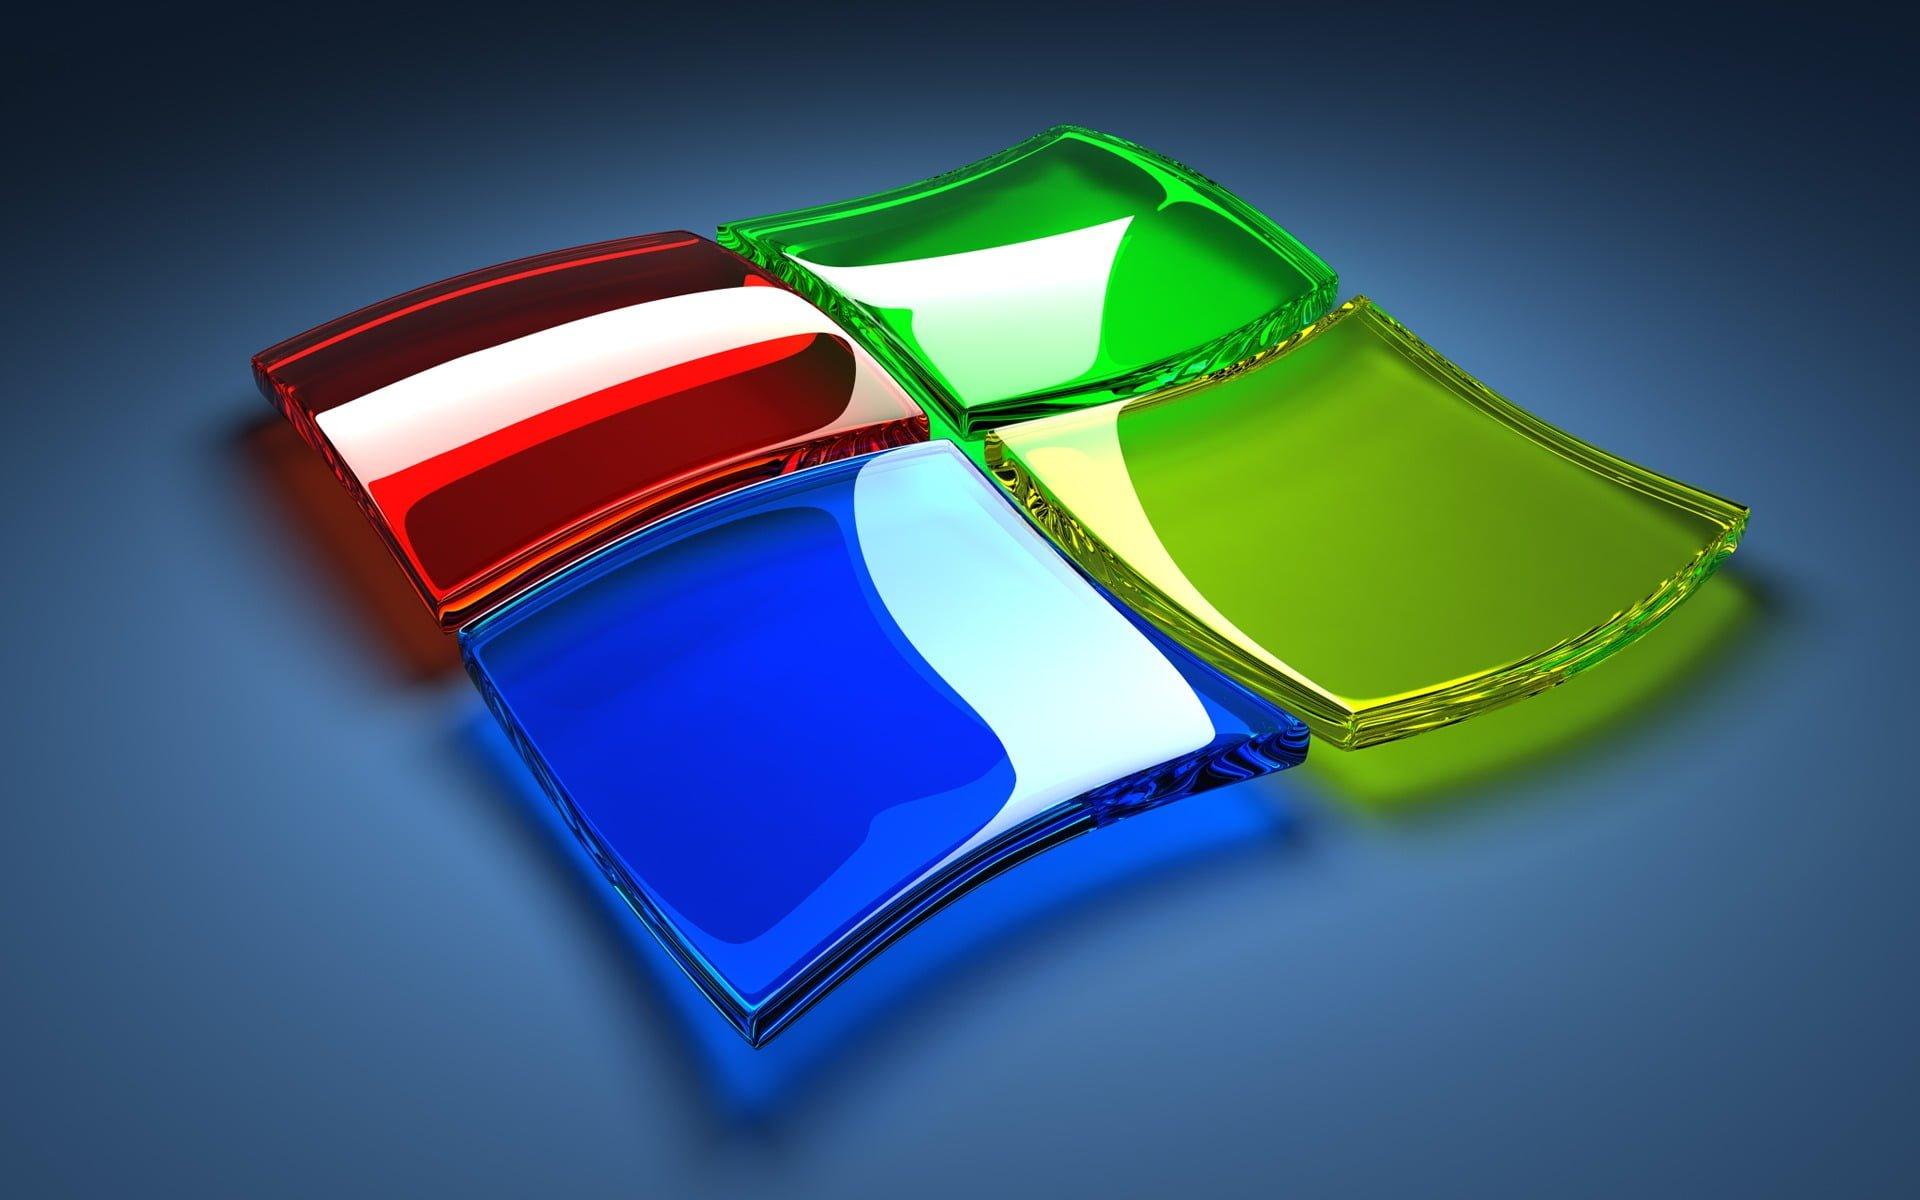 Usb ile Format Atma usb ile format atma Usb ile Format Atma 12 ocak 2015 windows 7 1